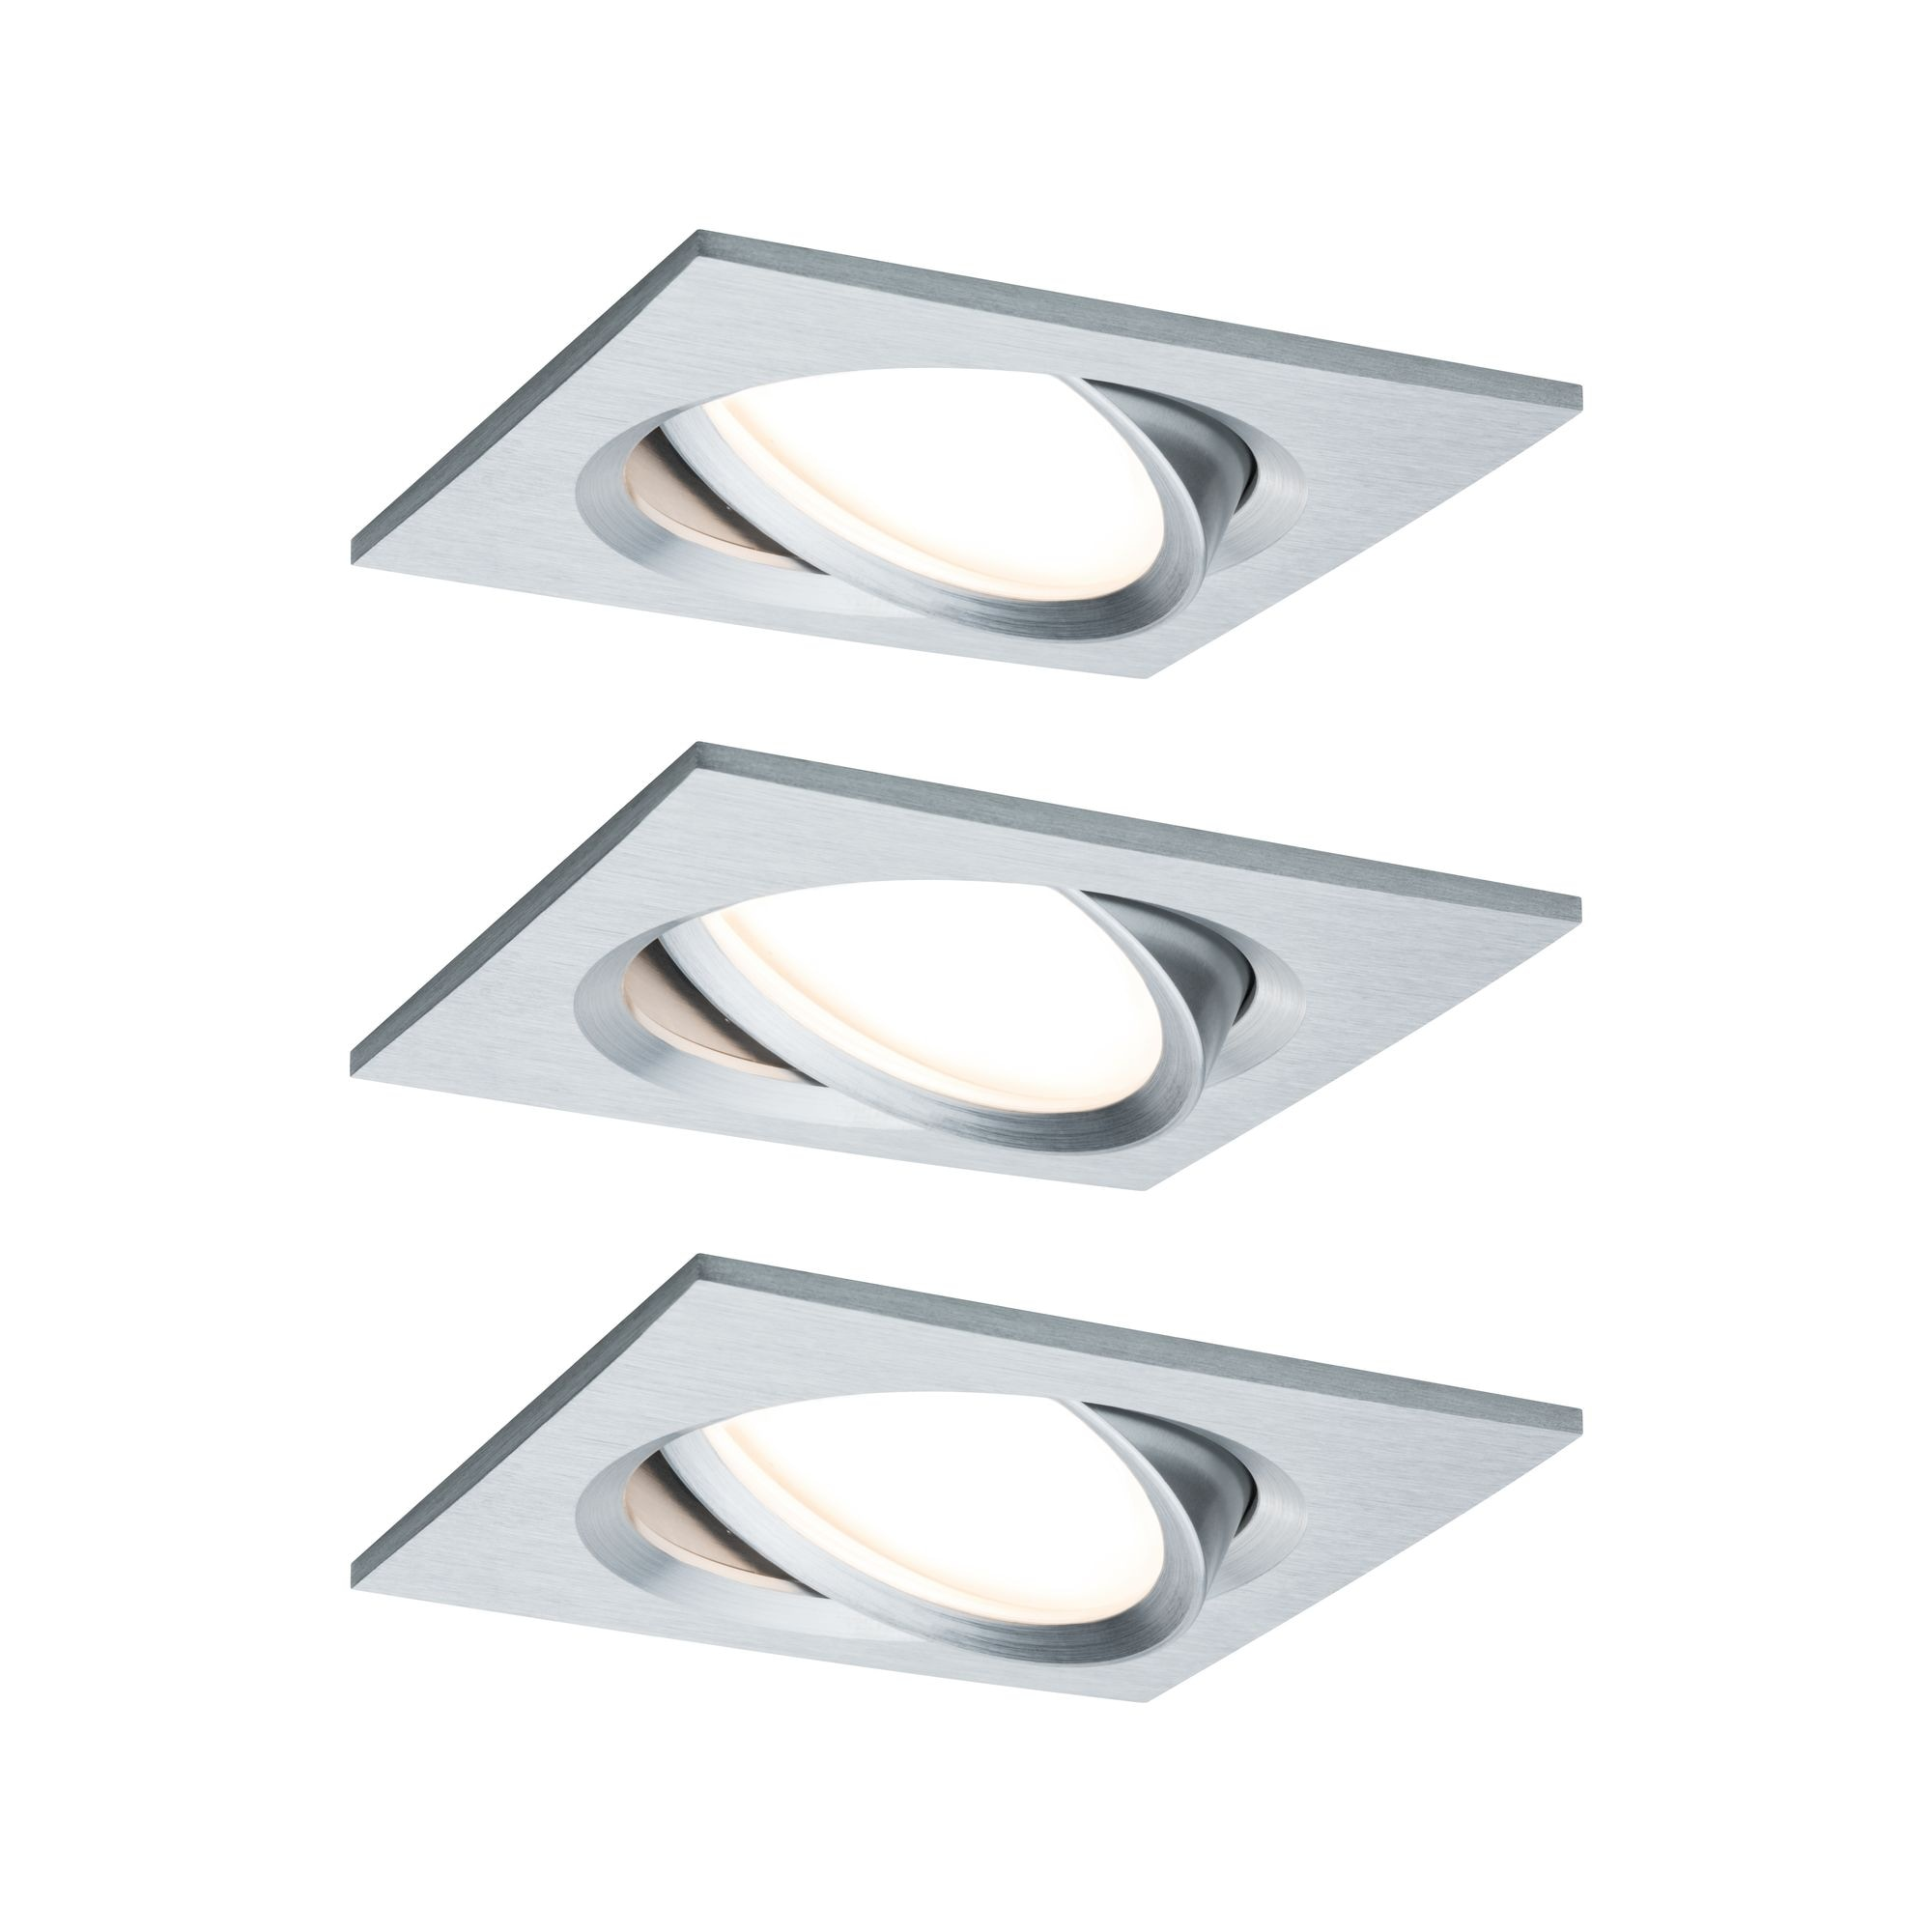 Paulmann LED Einbaustrahler Nova Plus eckig 3x6,8W Alu schwenkbar dimmbar, 3 St., Warmweiß